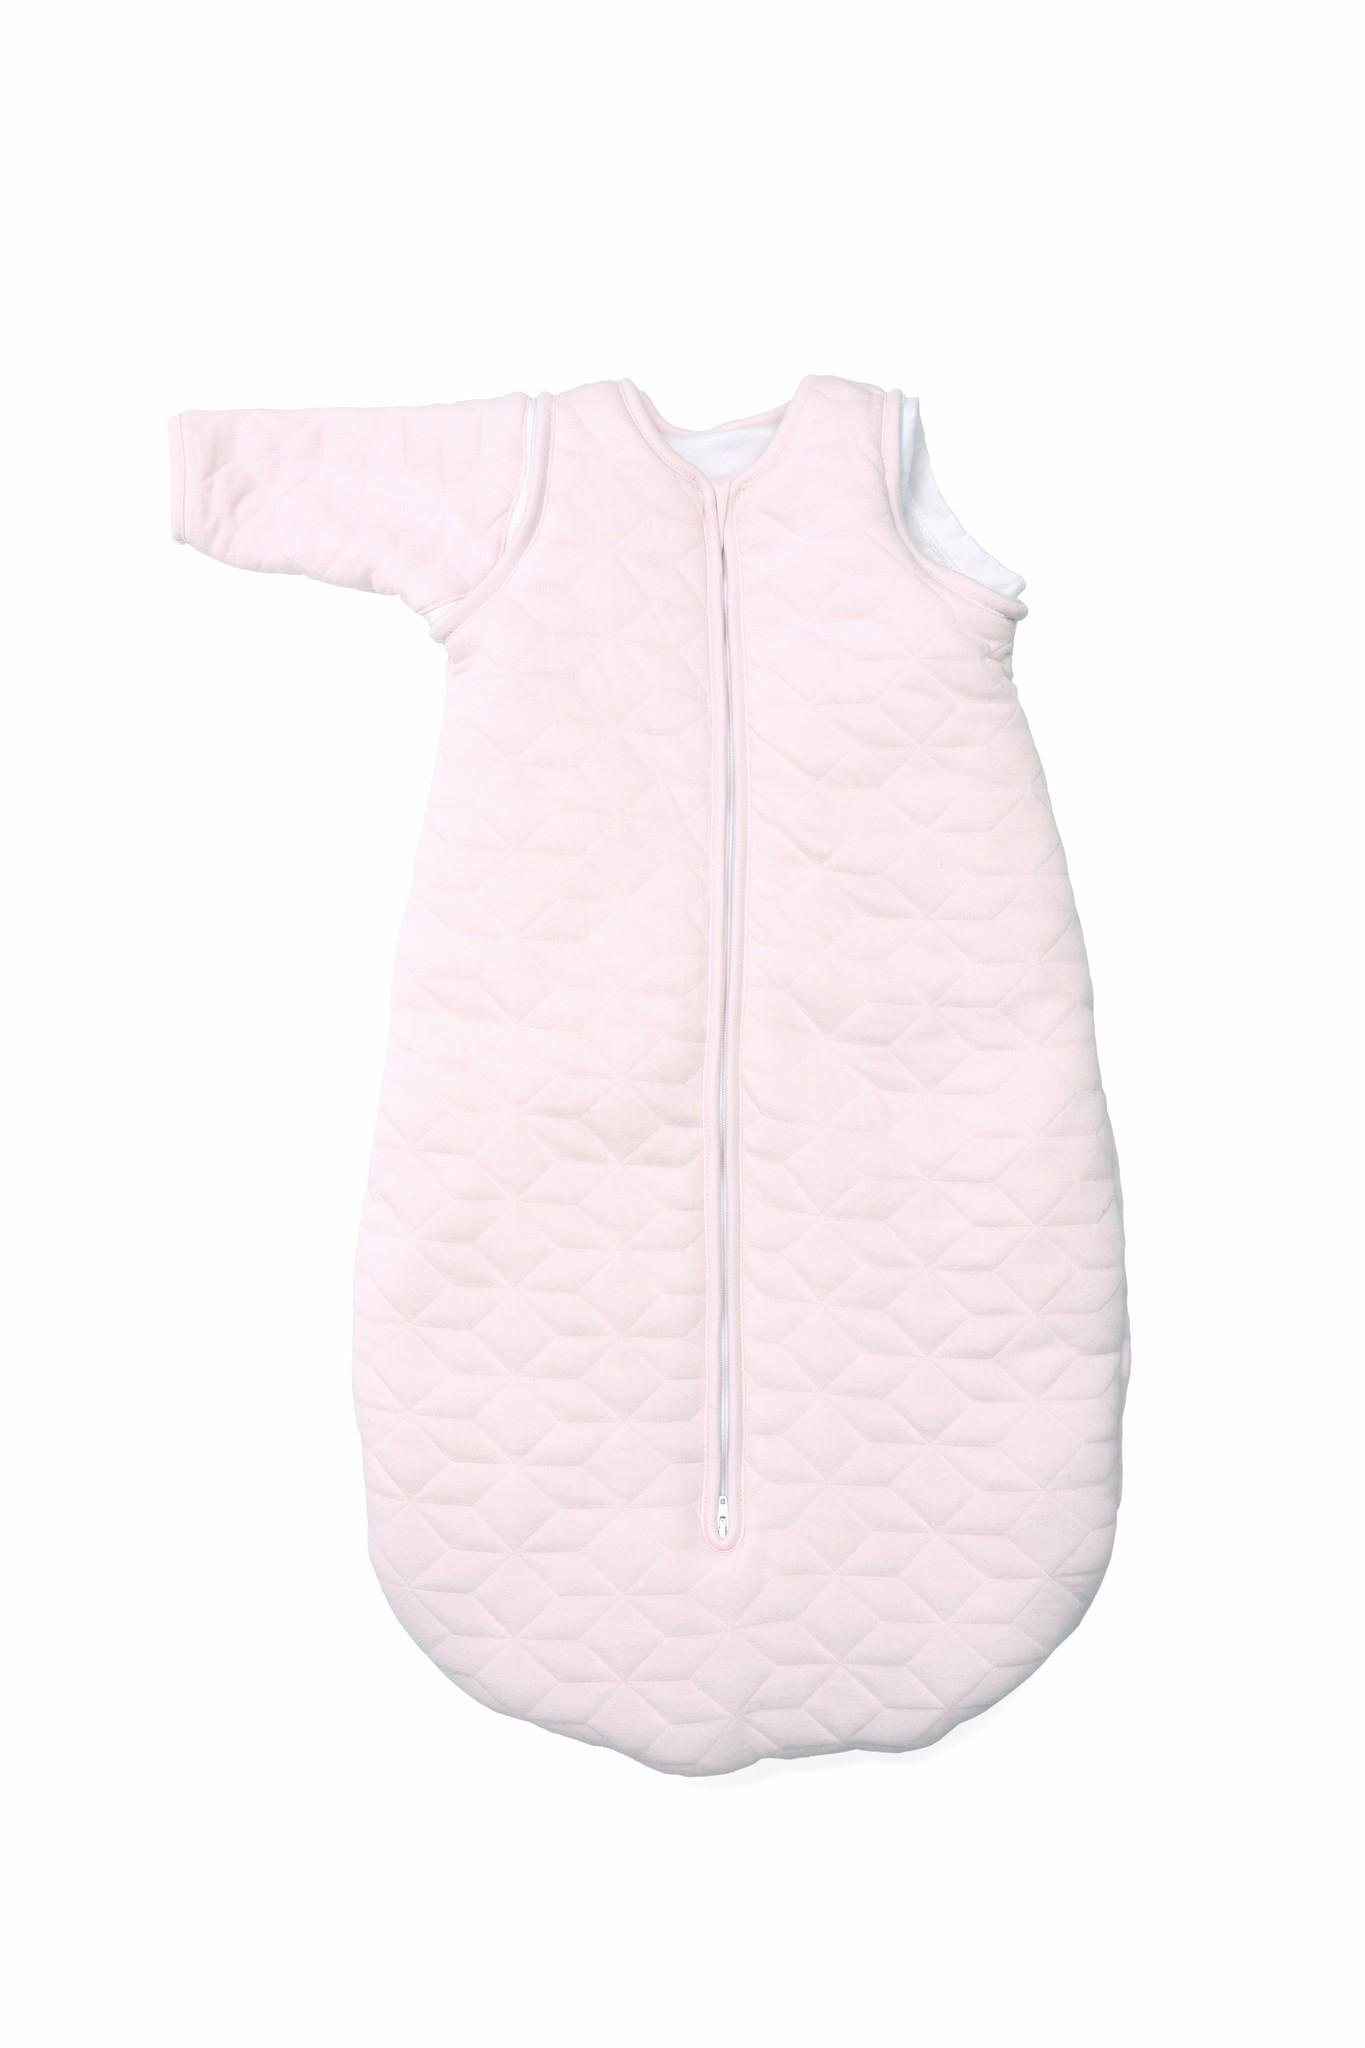 Jersey slaapzak 70cm met afritsbare mouwen Star Soft Pink-3